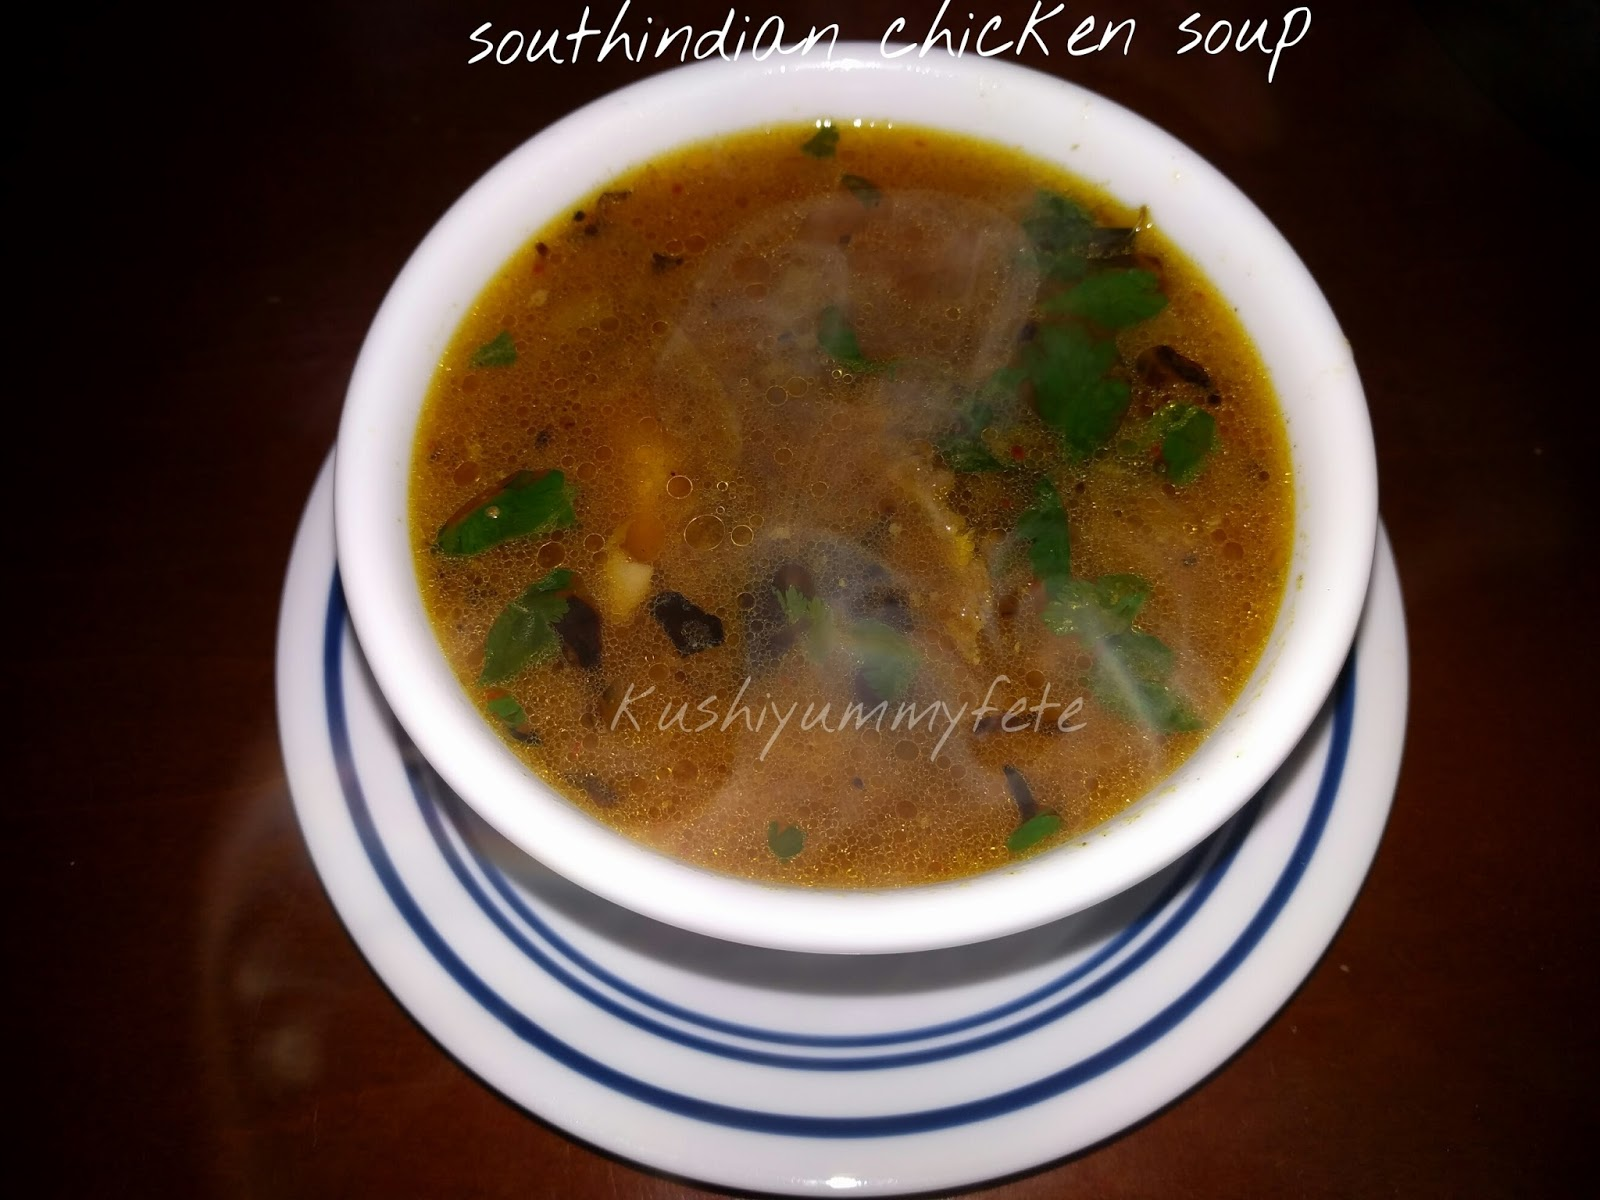 Kushinds rasoi homemade chicken soupsouth indian chicken soup recipe southindian chickensoup forumfinder Gallery